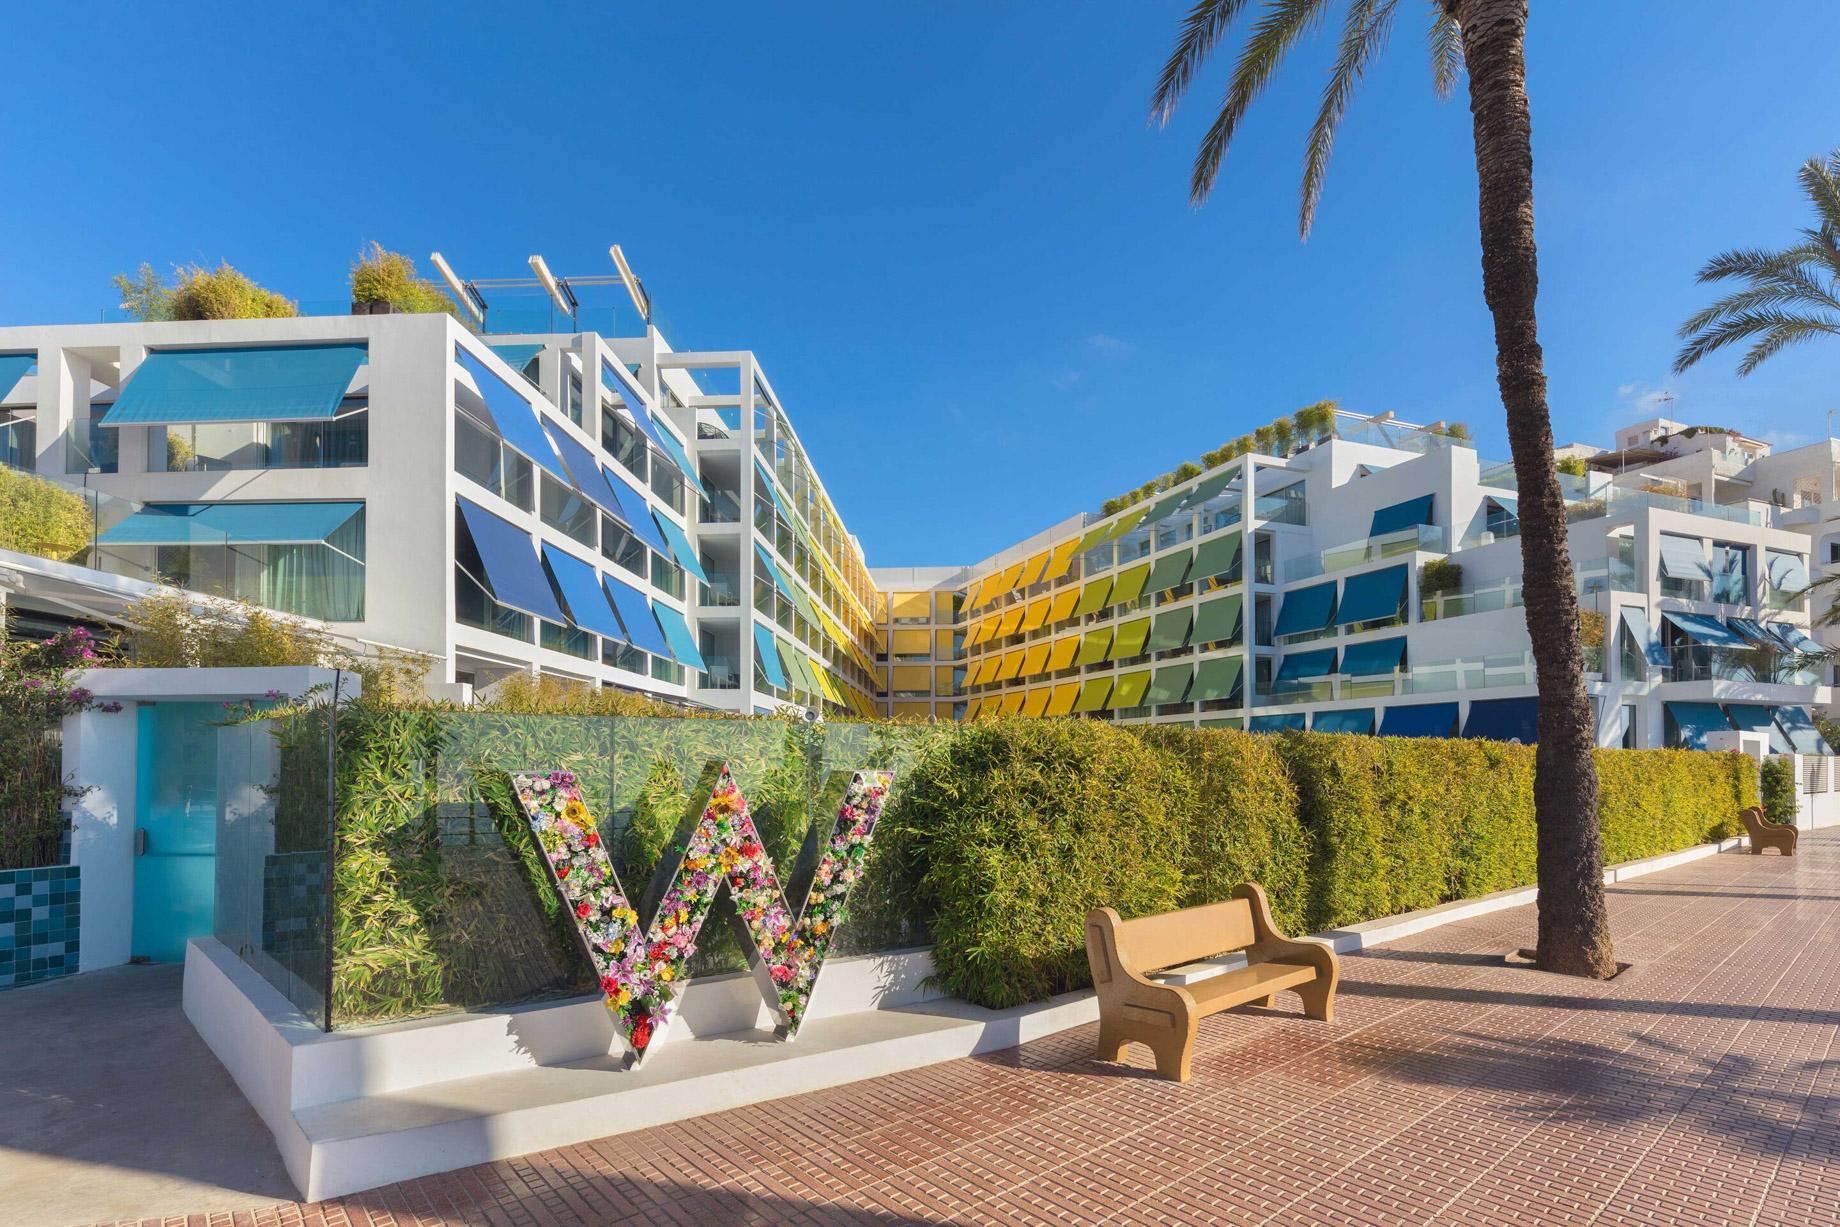 W Ibiza Luxury Hotel - Santa Eulalia del Rio, Spain - W Ibiza Boulevard Entrance